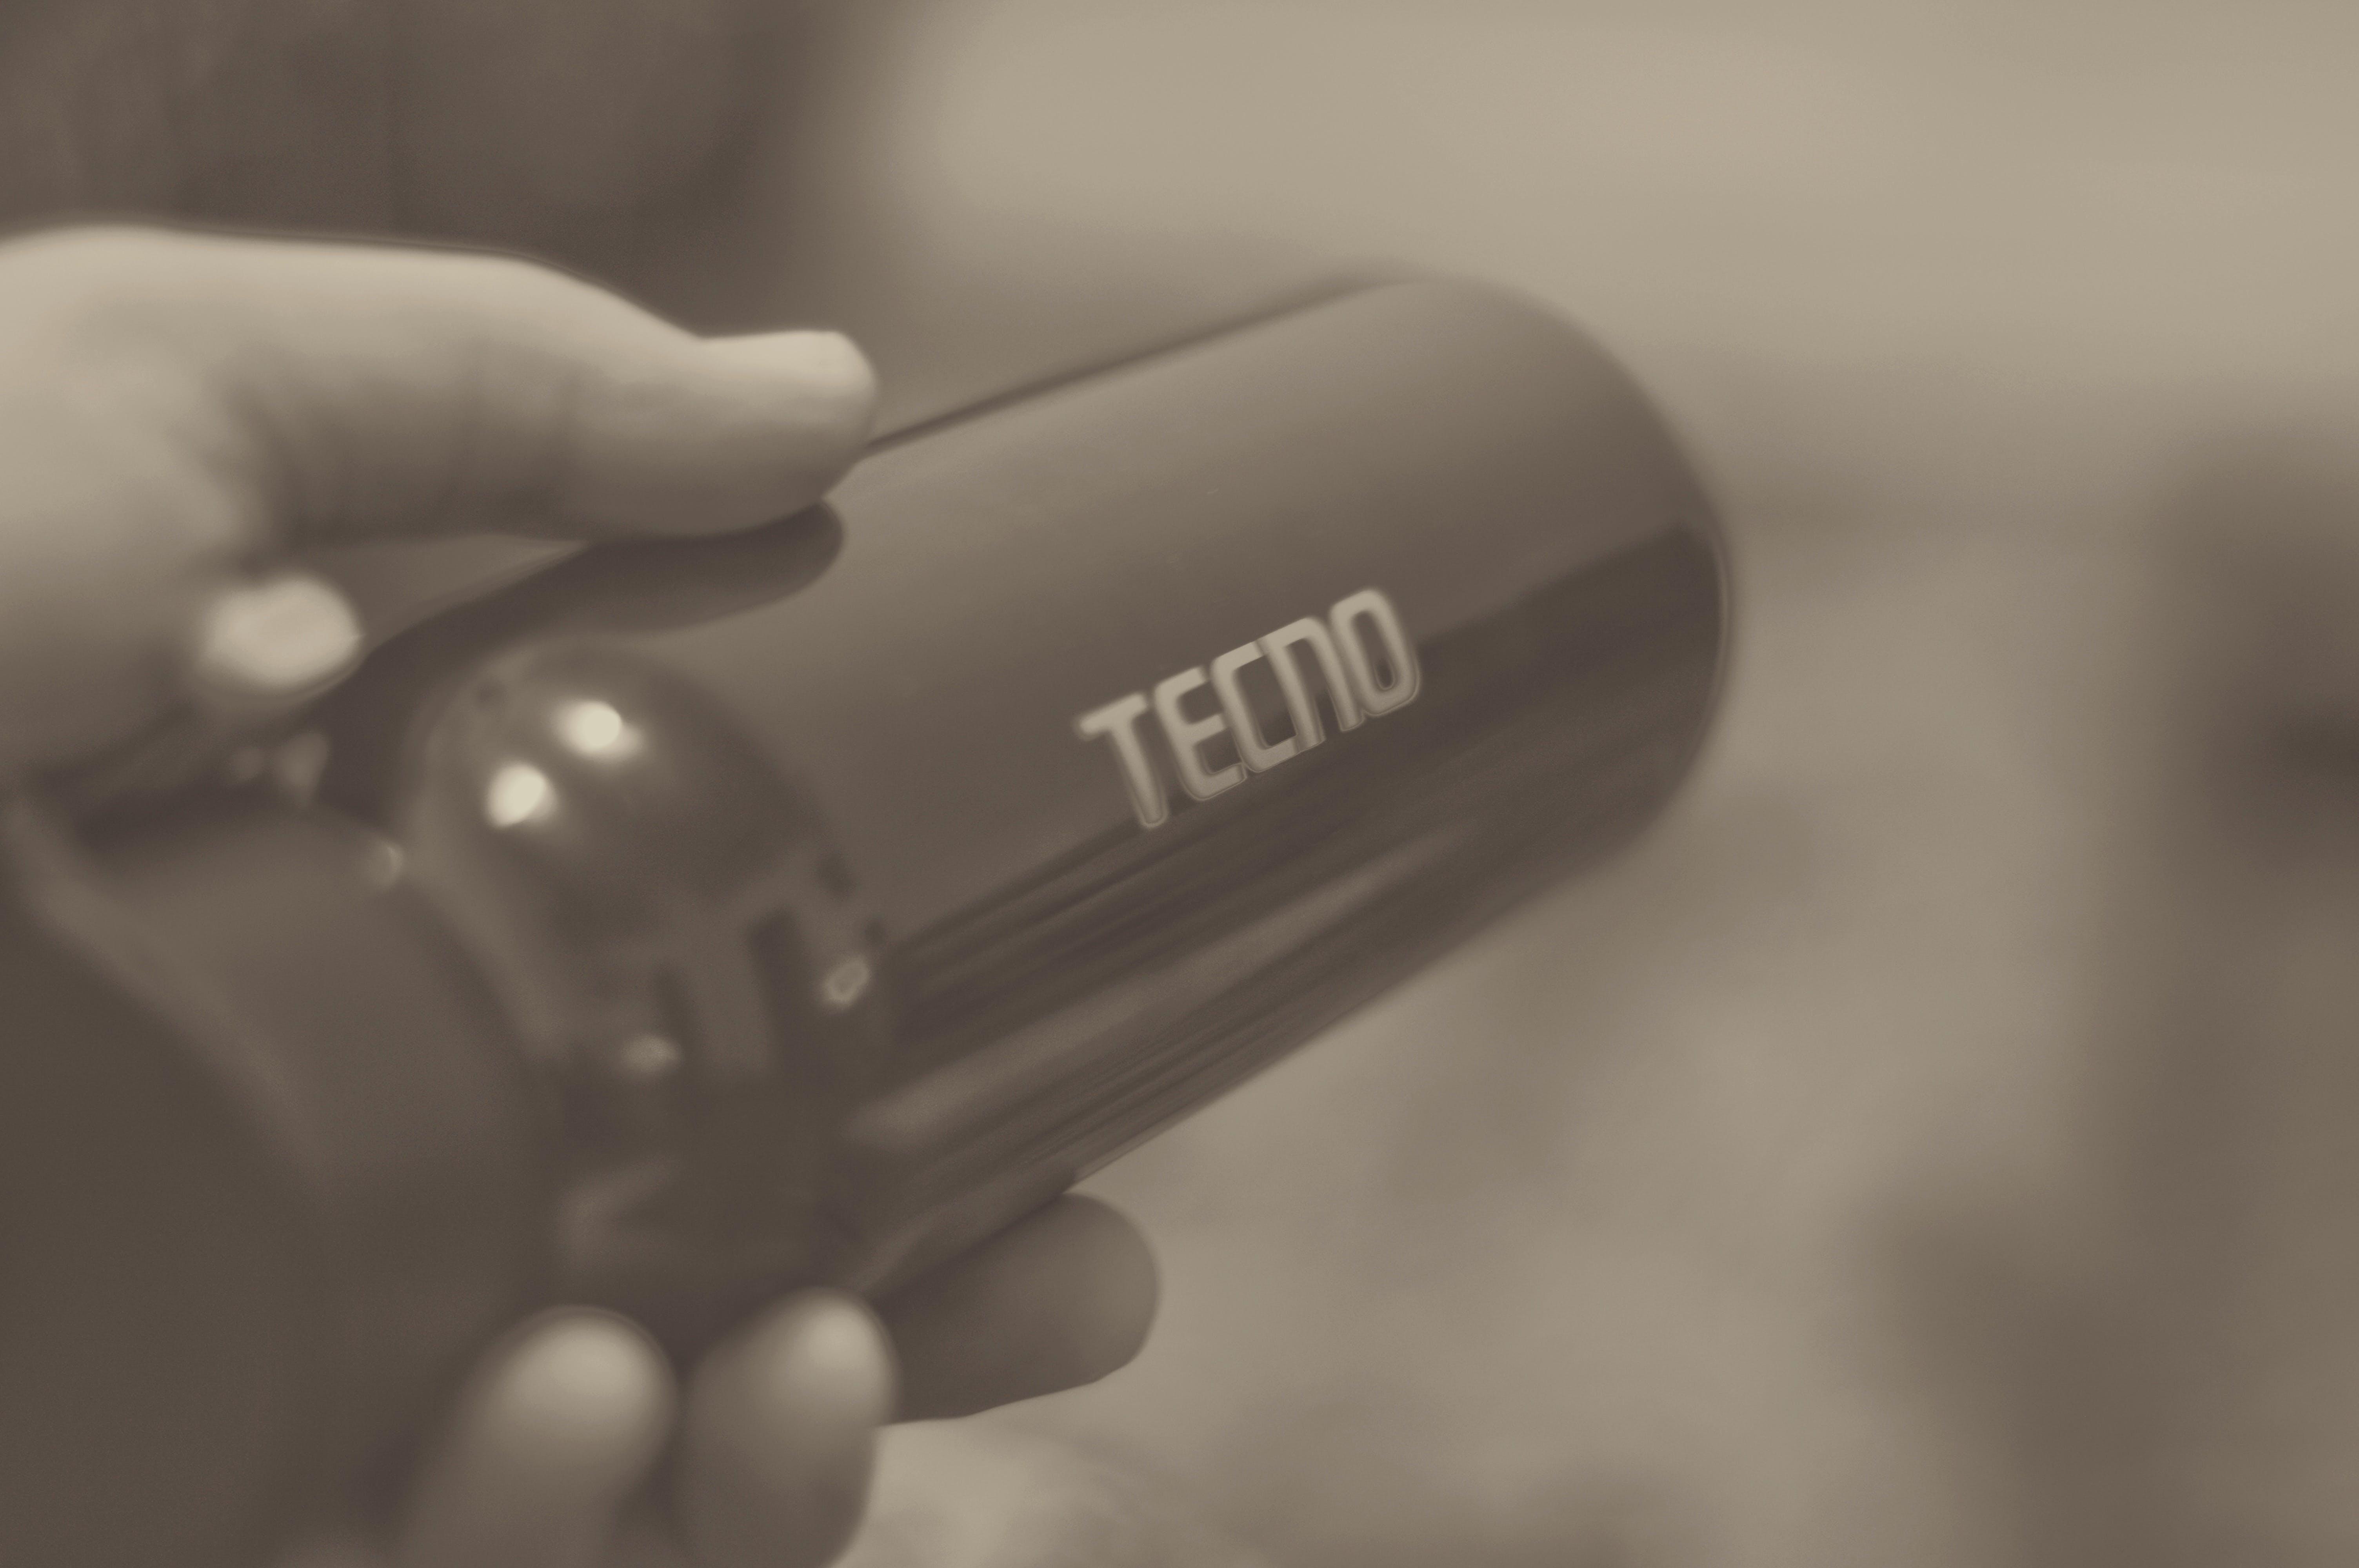 Free stock photo of black and white, bottle, hand, TECNO